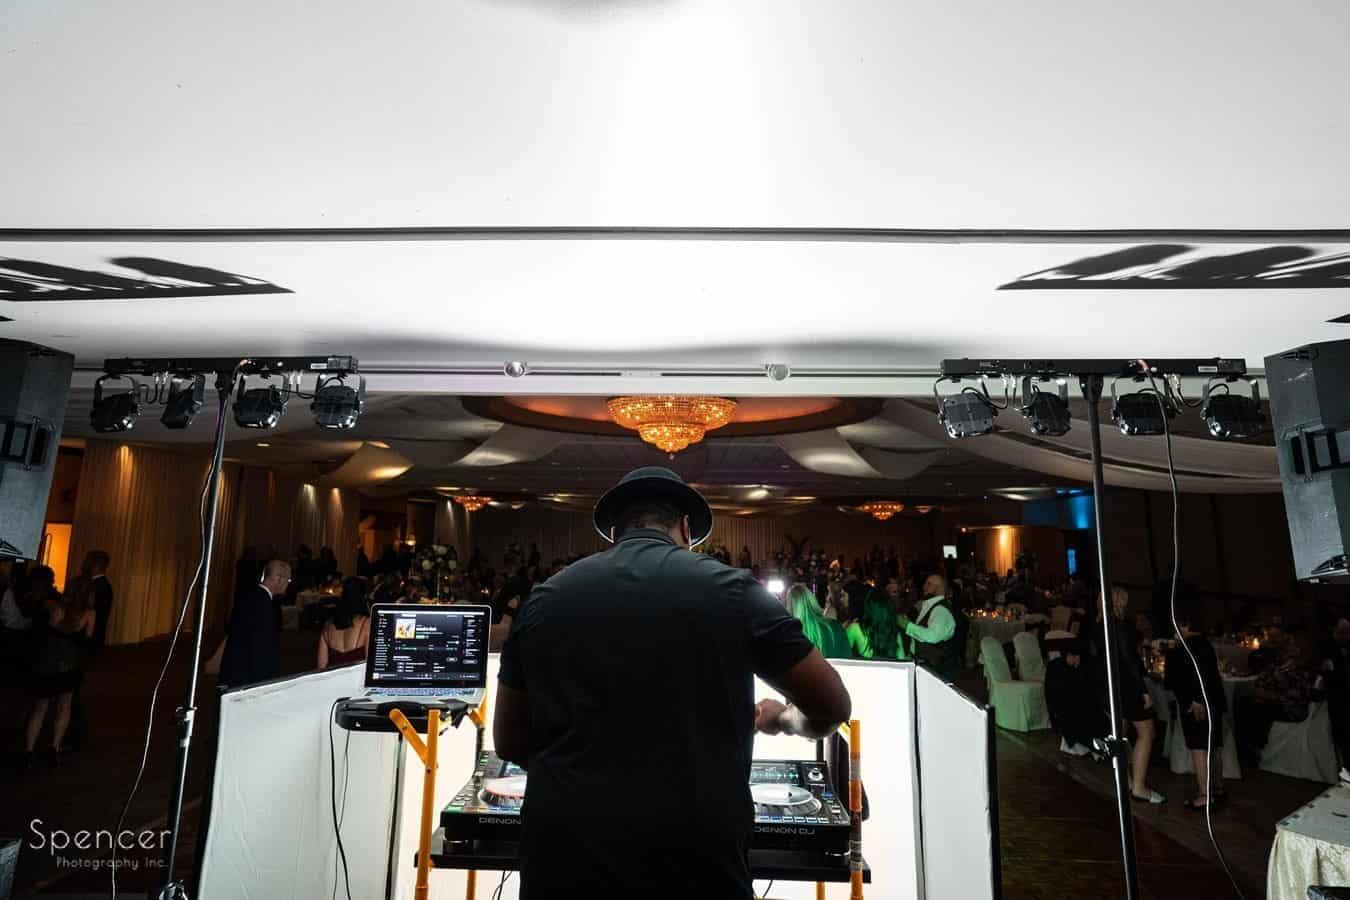 dj london bridges works wedding reception at LaMalfa